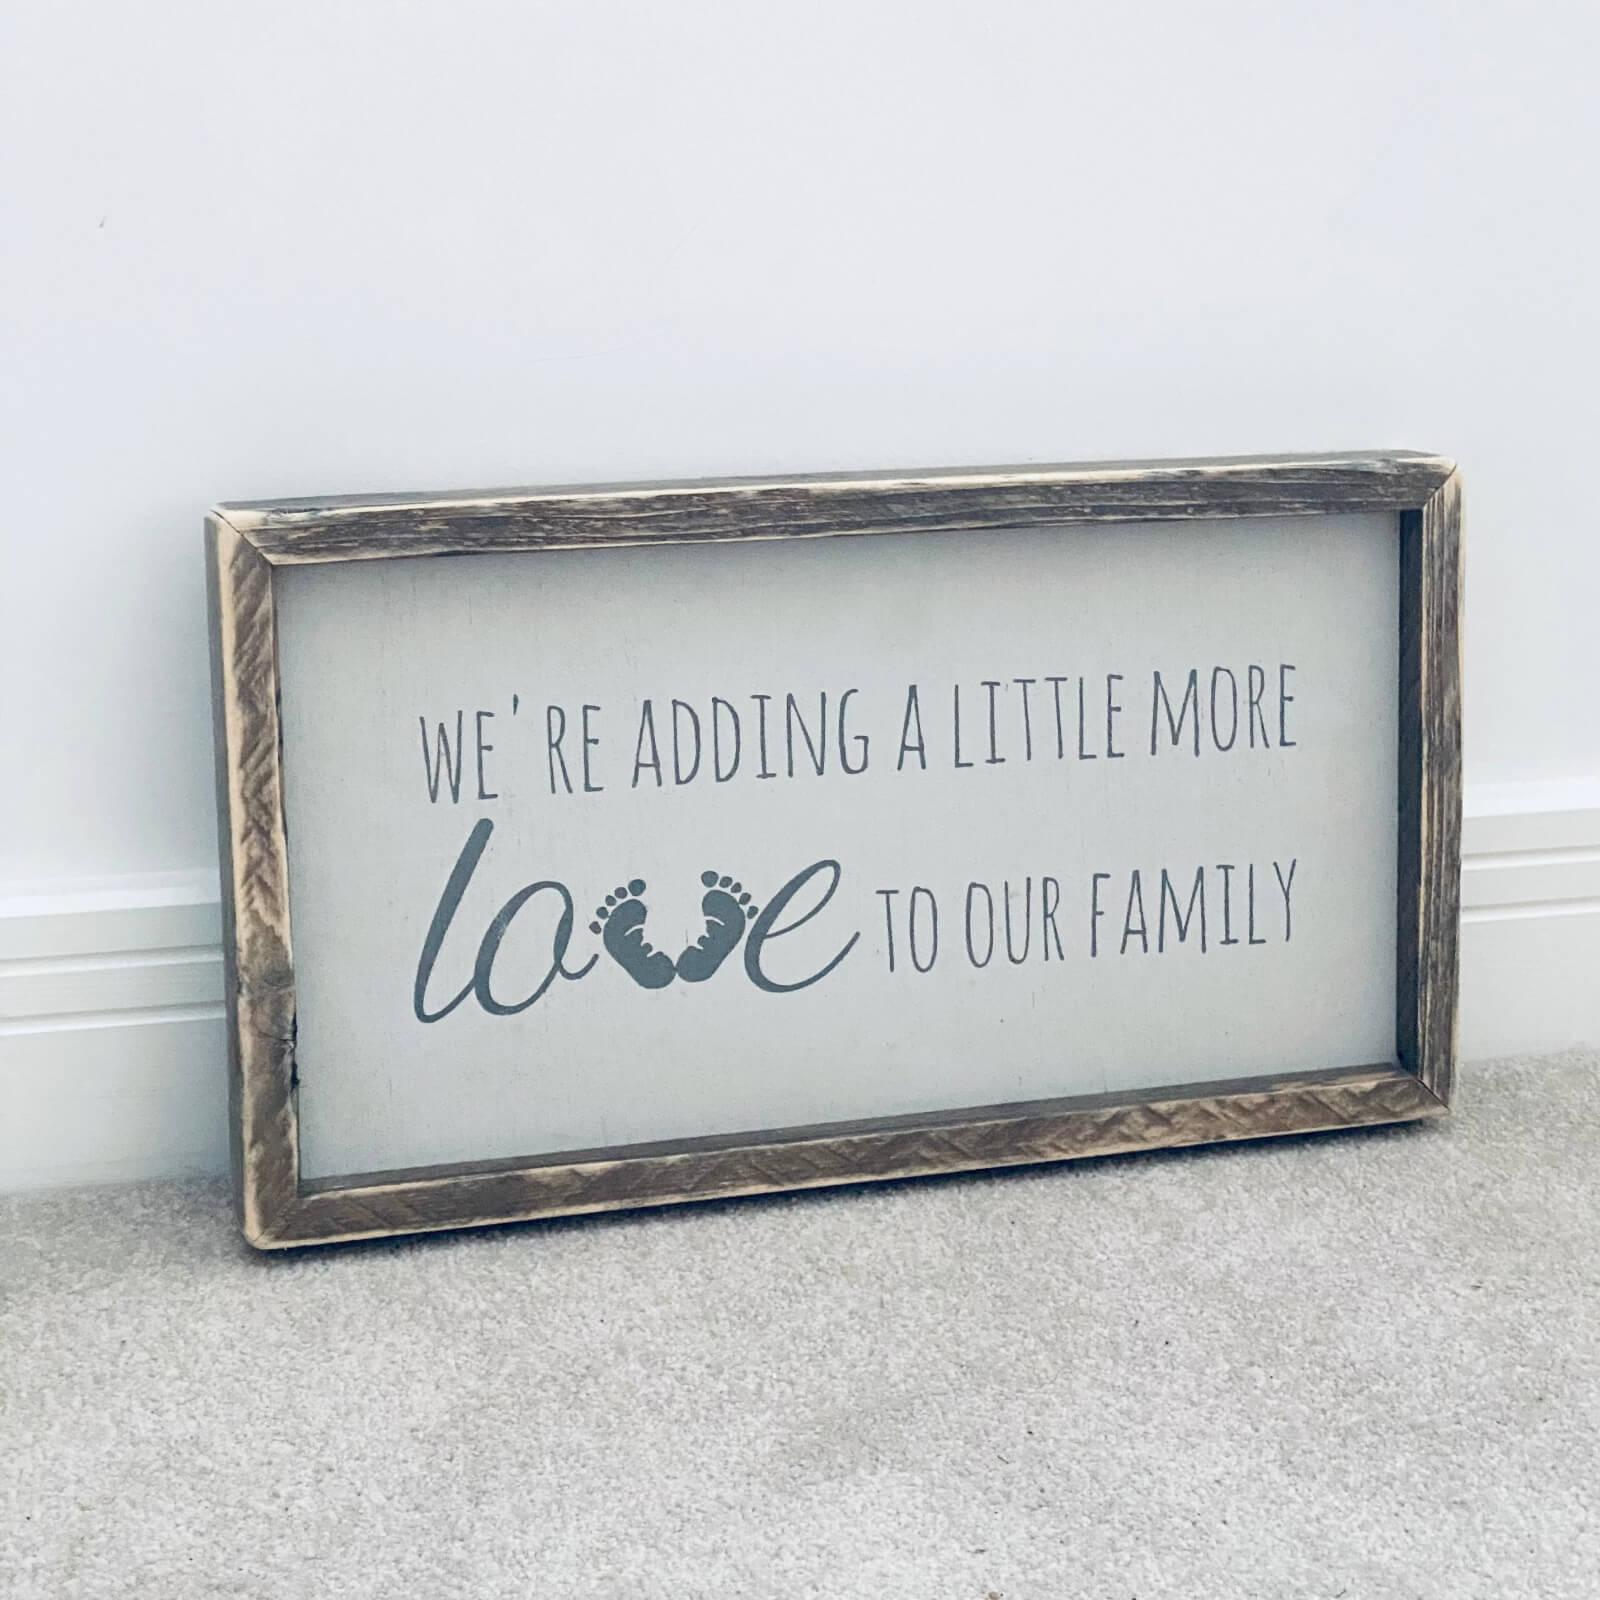 We're adding a little more love – Pregnancy Announcement – Framed Wooden Sign Kind Shop